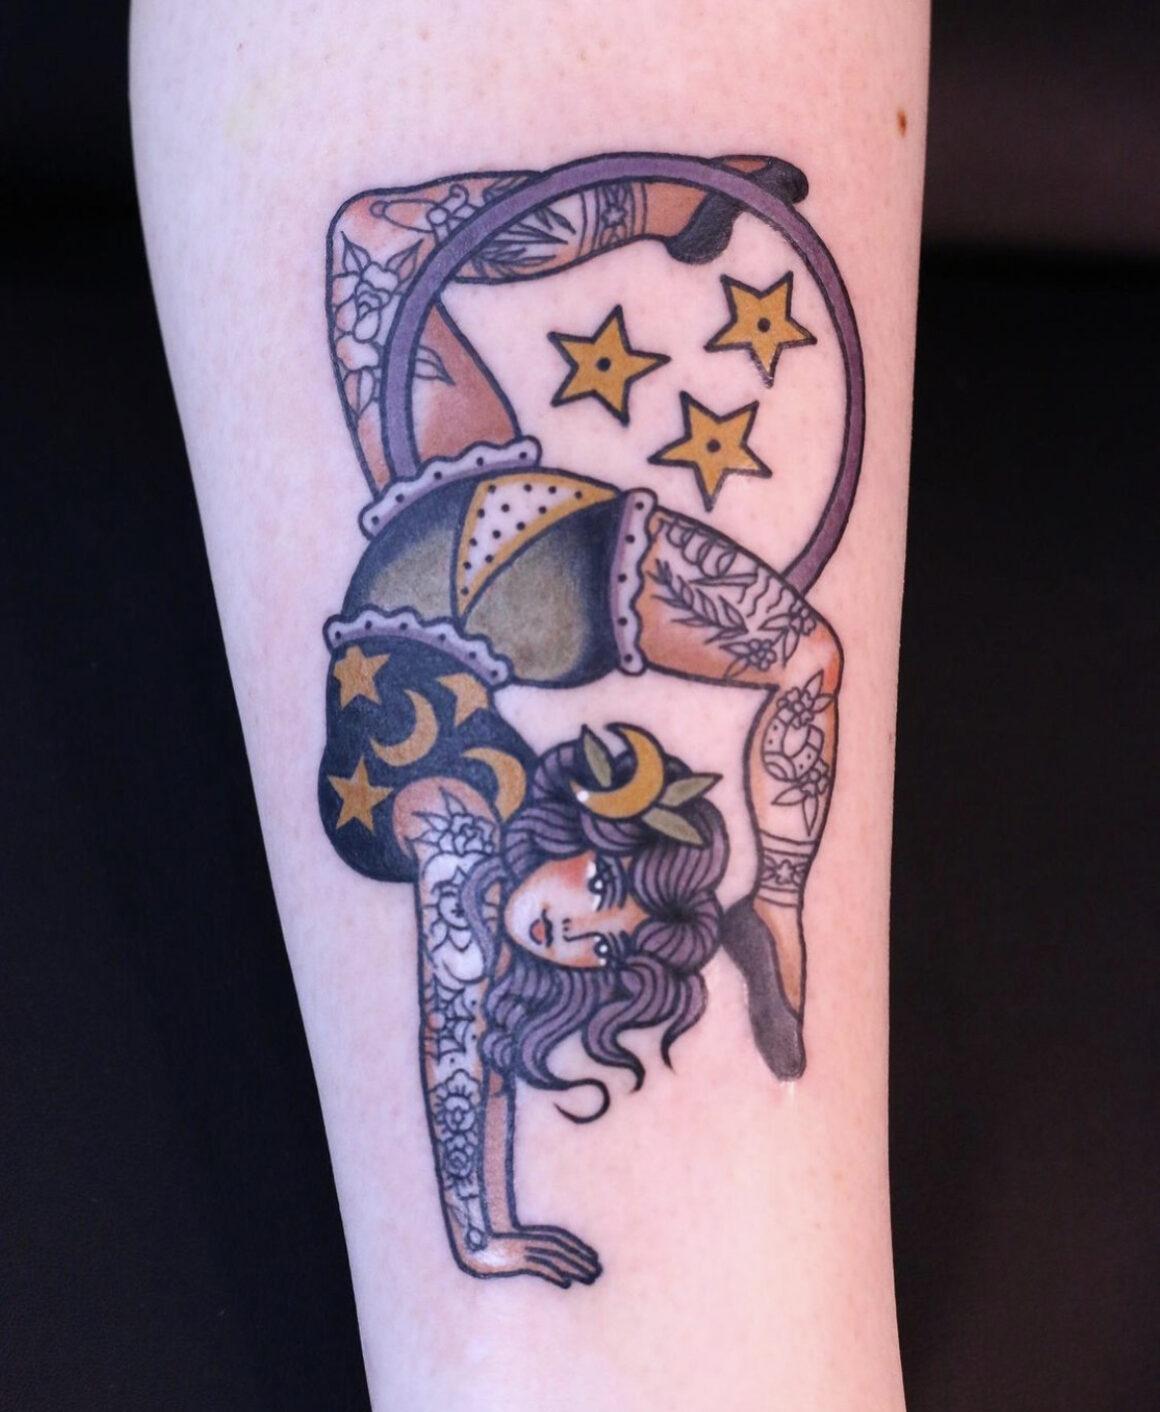 Eve Mansell, Bloom Street Tattoo Studio, Manchester, UK